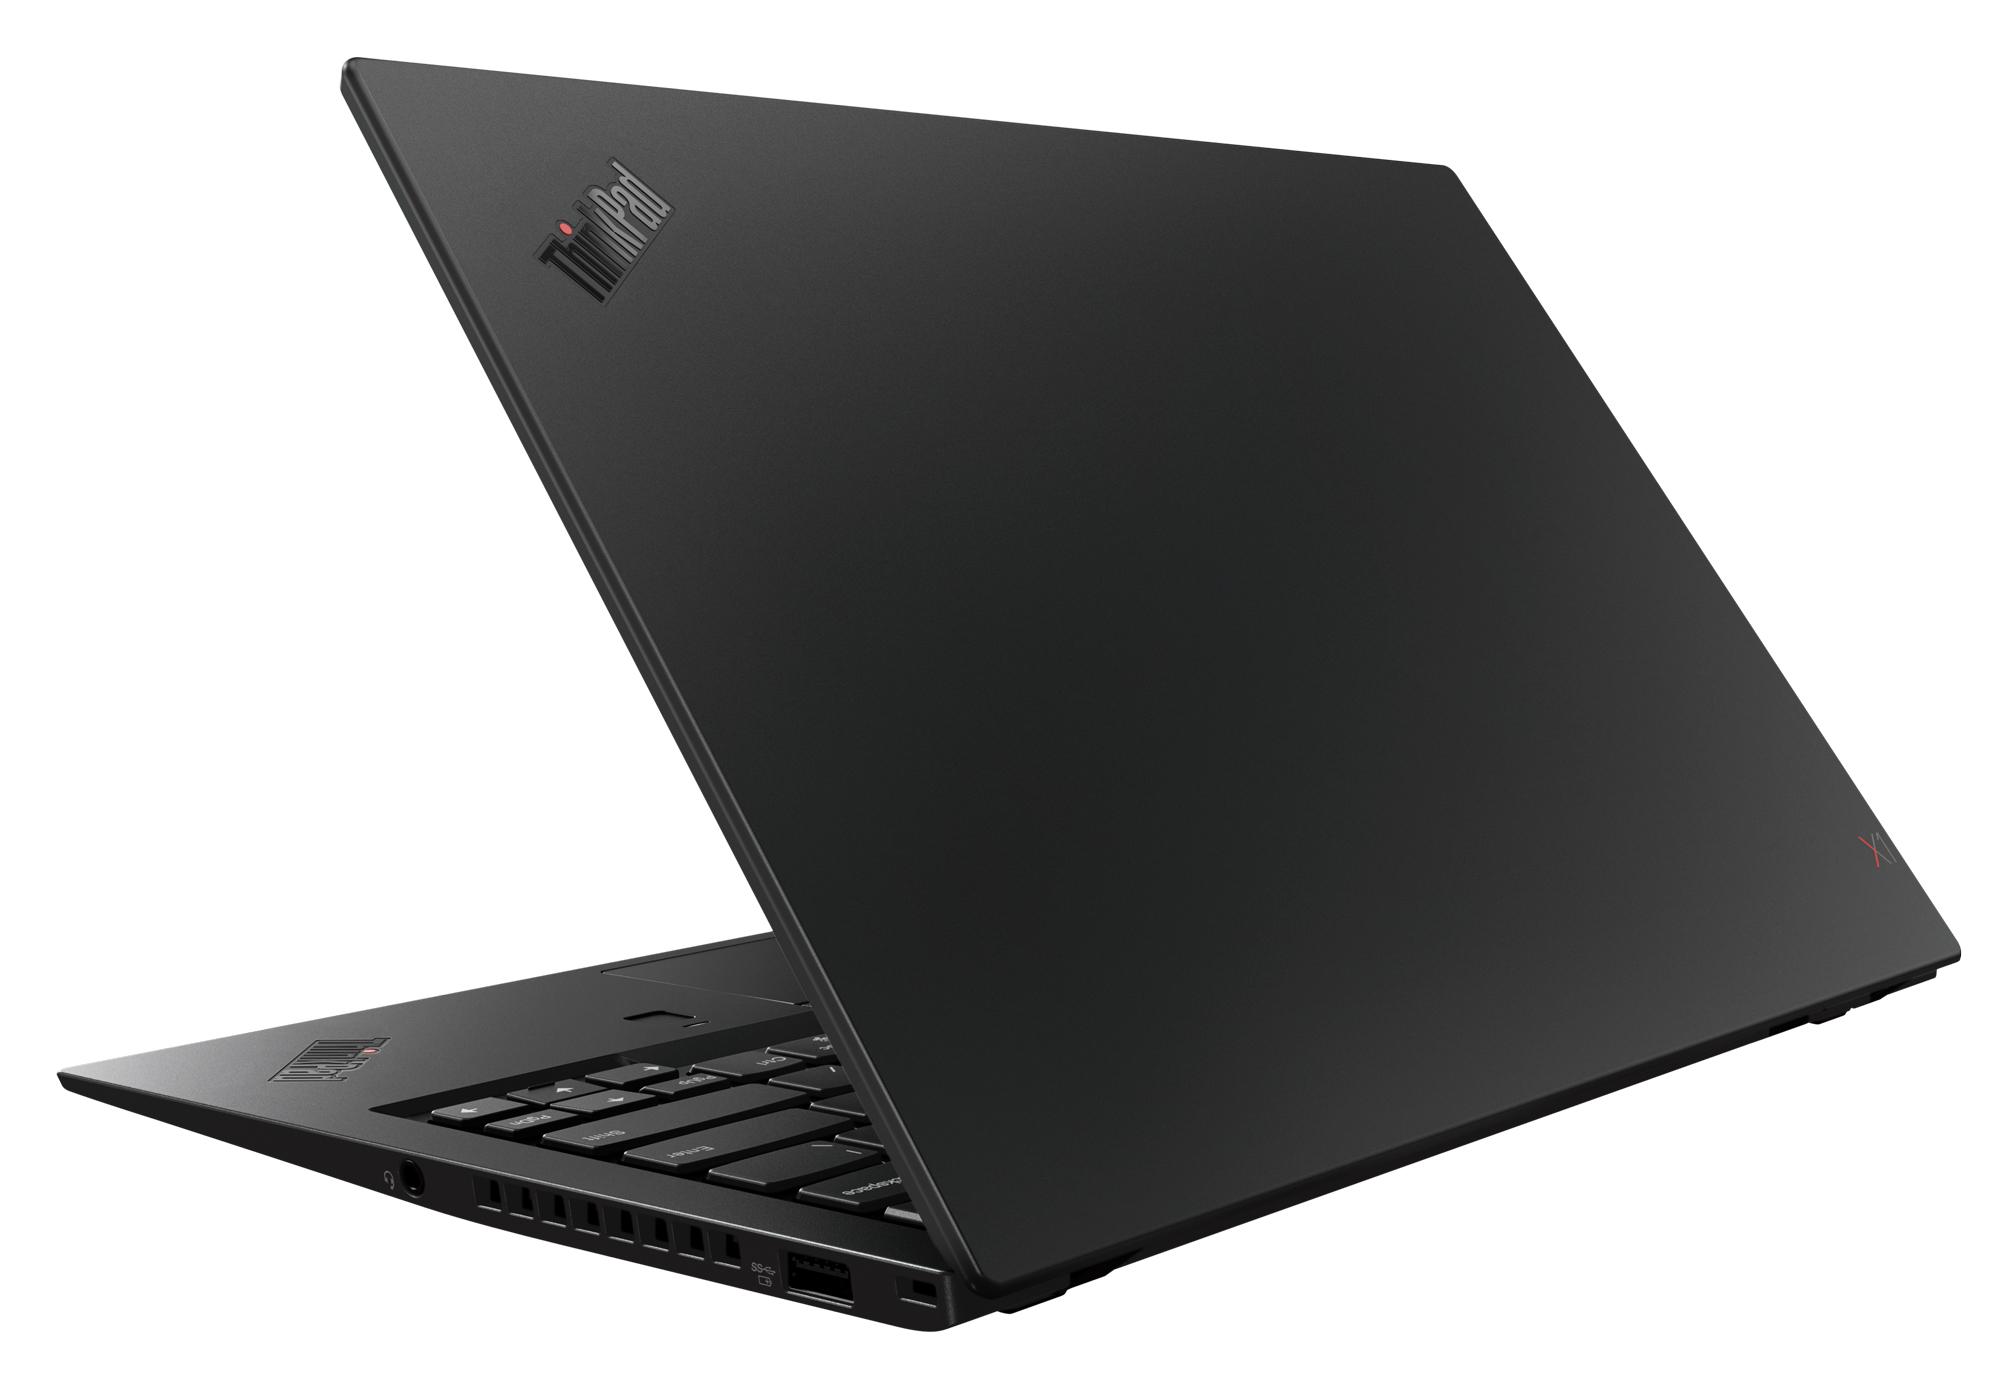 Фото  Ультрабук ThinkPad X1 Carbon 6th Gen (20KH0039RT)